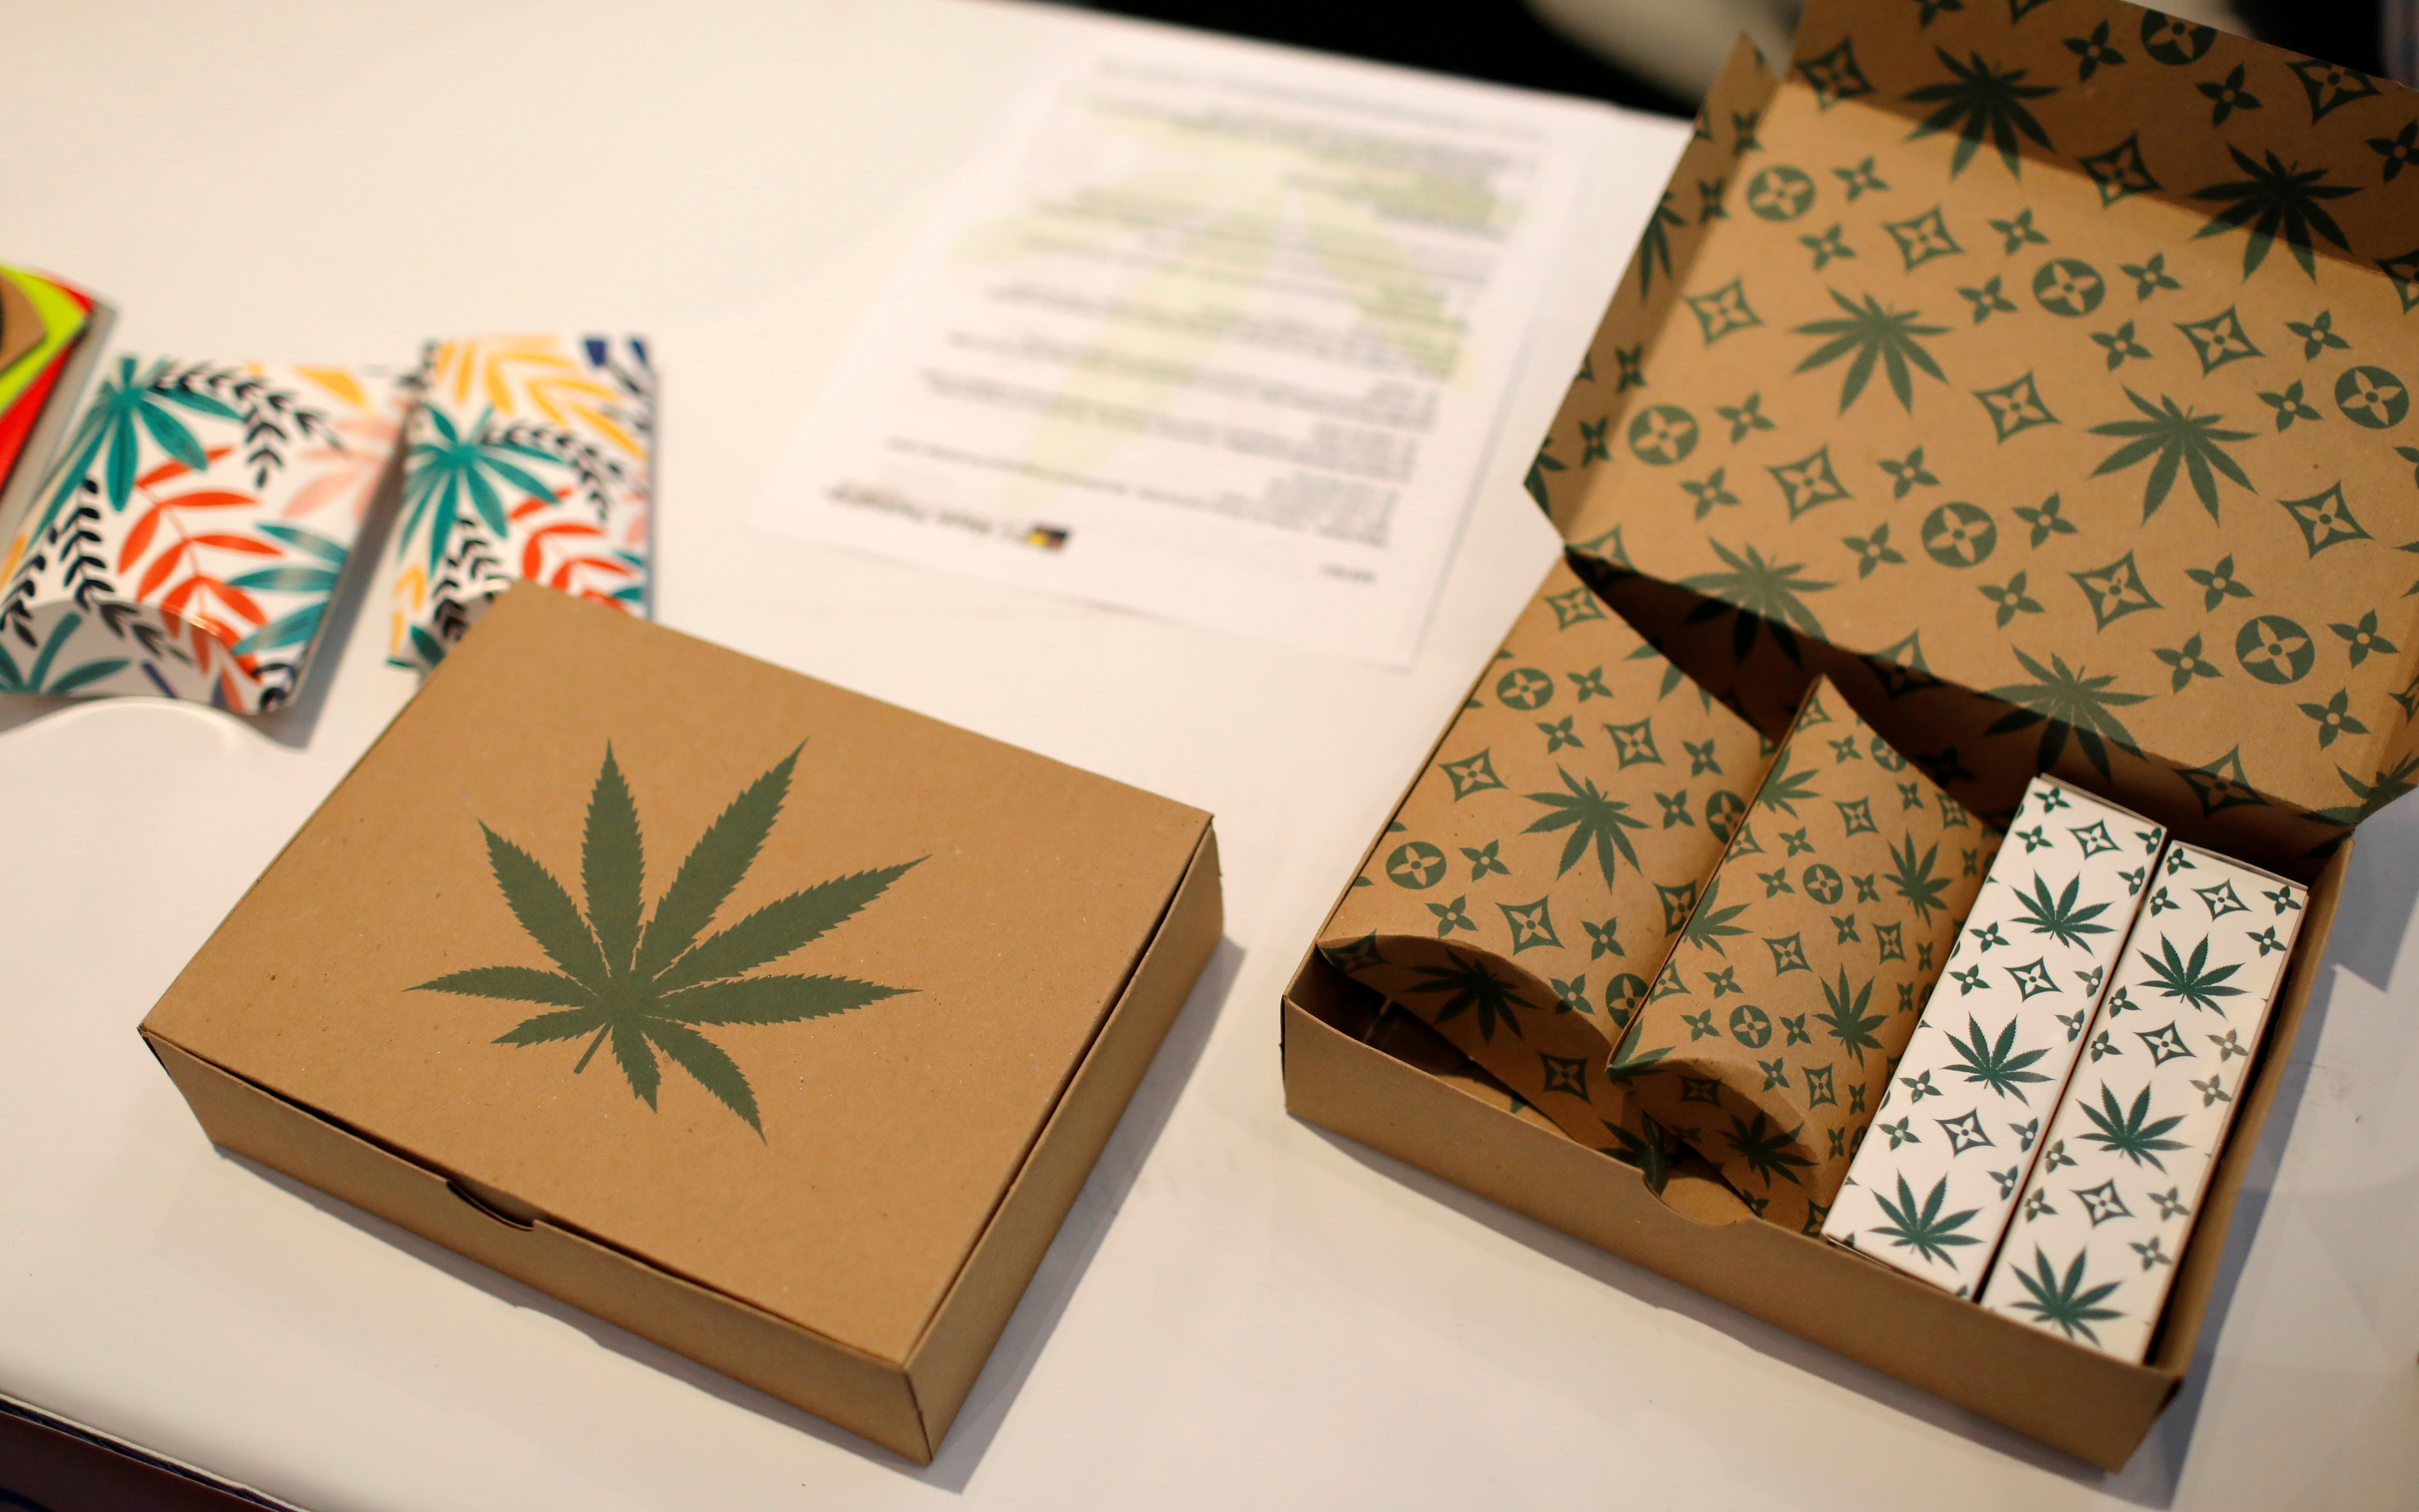 brookings.edu - John Hudak - A plan for marijuana policy reform